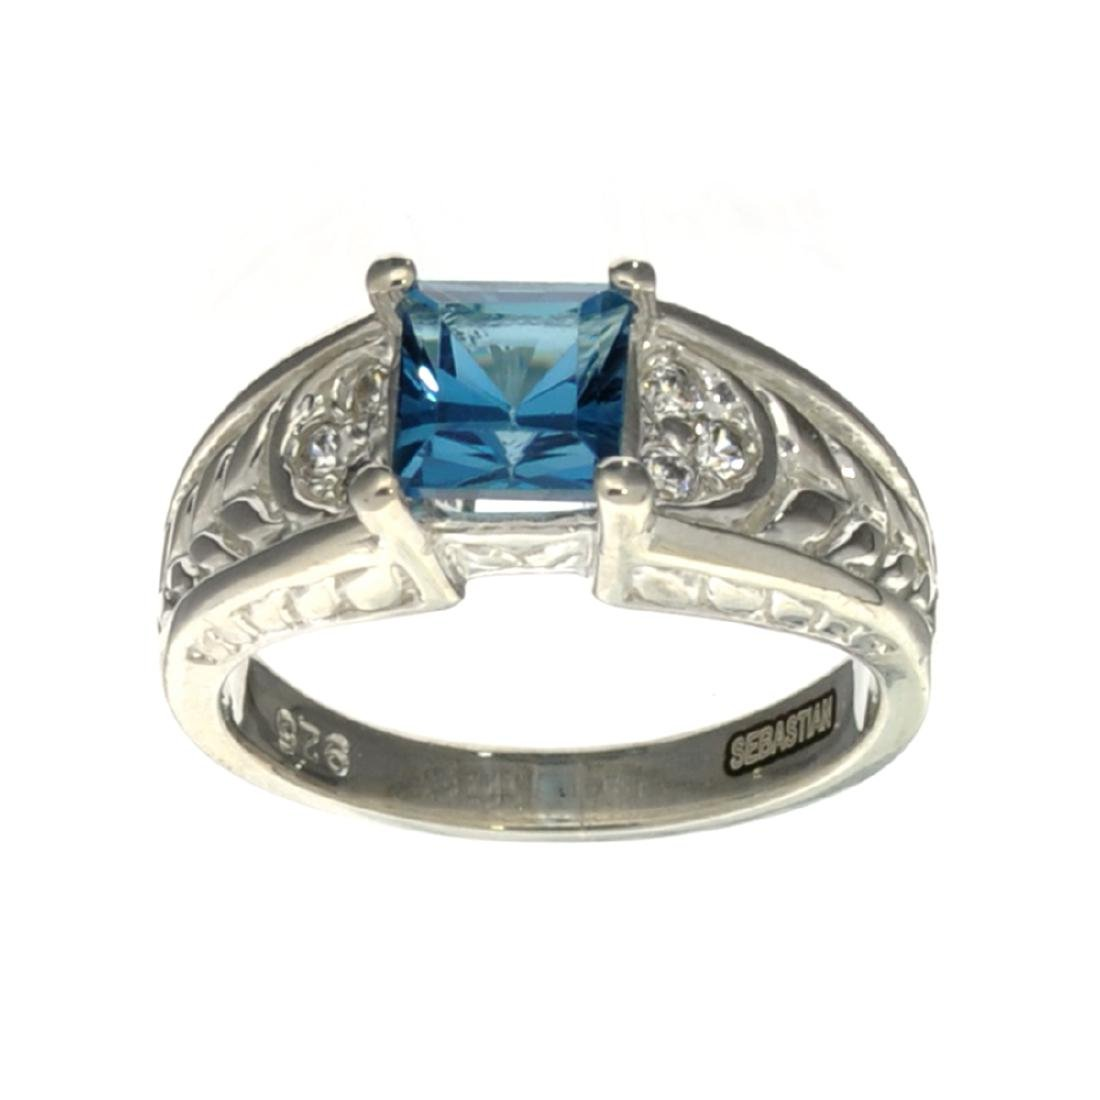 APP: 0.5k Fine Jewelry Designer Sebastian, 1.90CT Blue